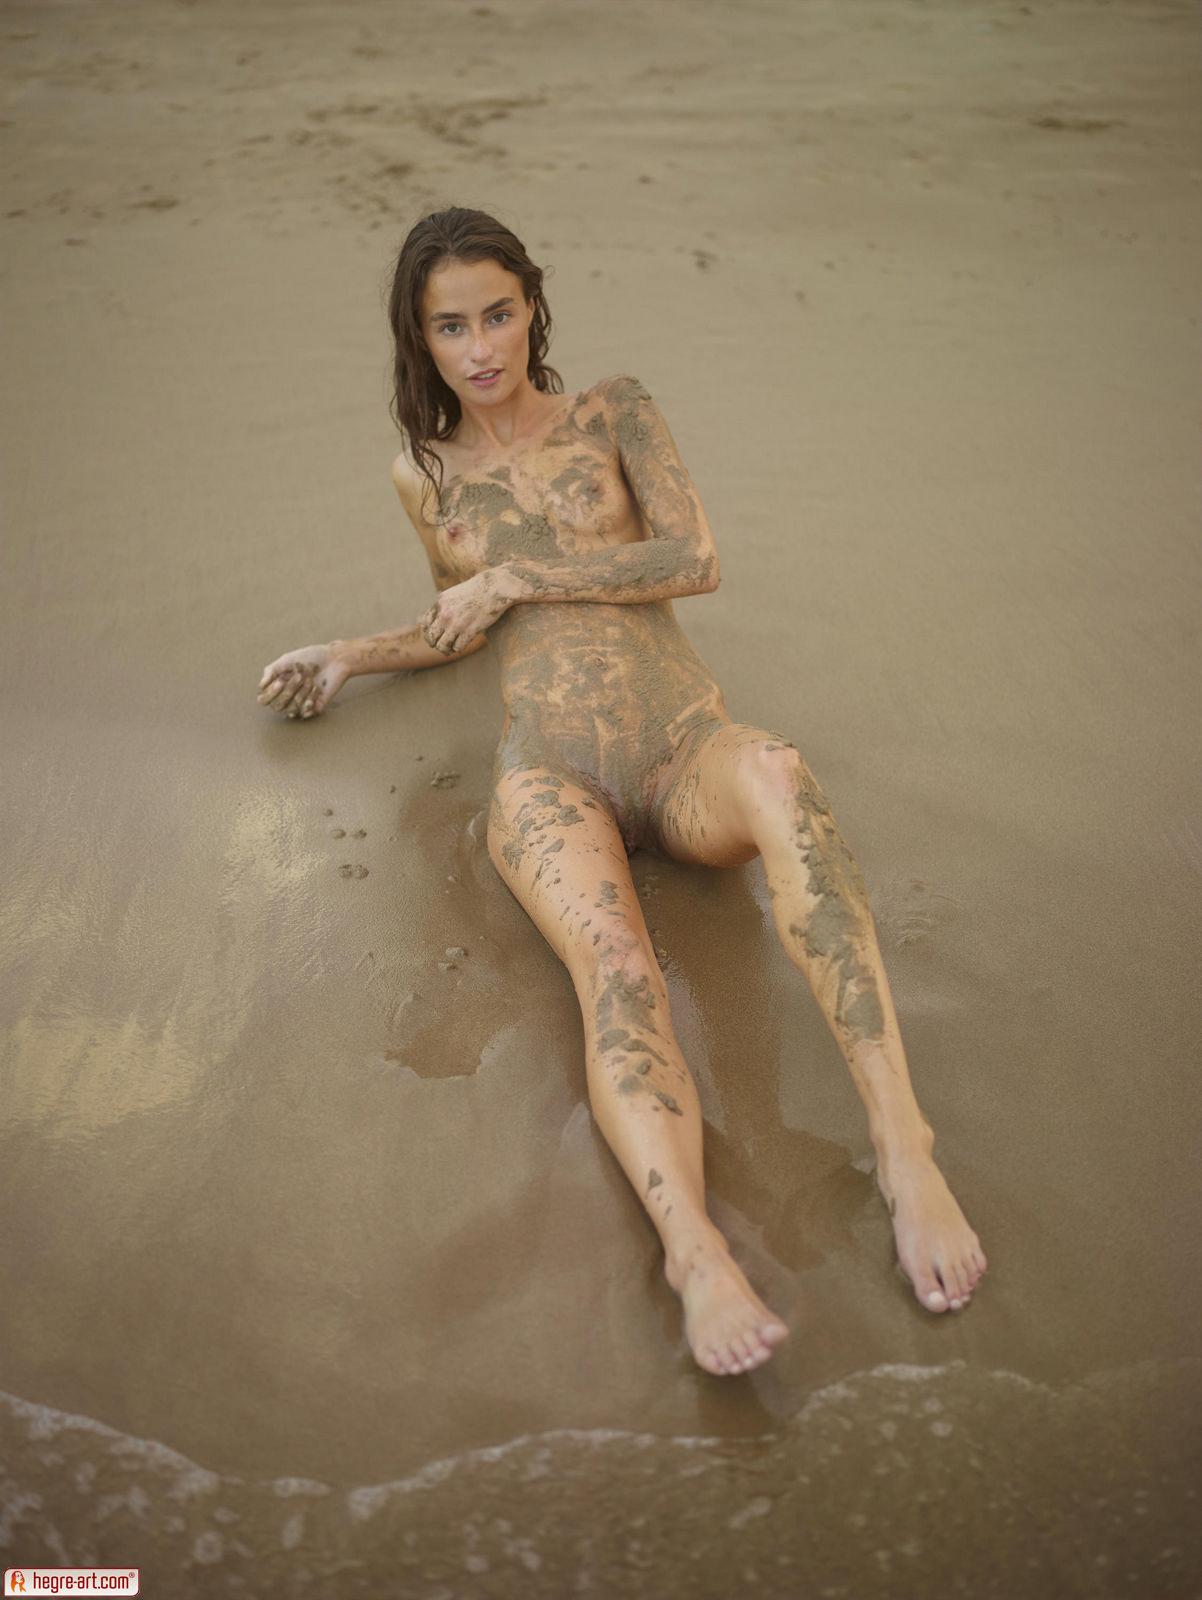 Cleo in Dirty Beach Bum by Hegre-Art (16 photos) | Erotic ...